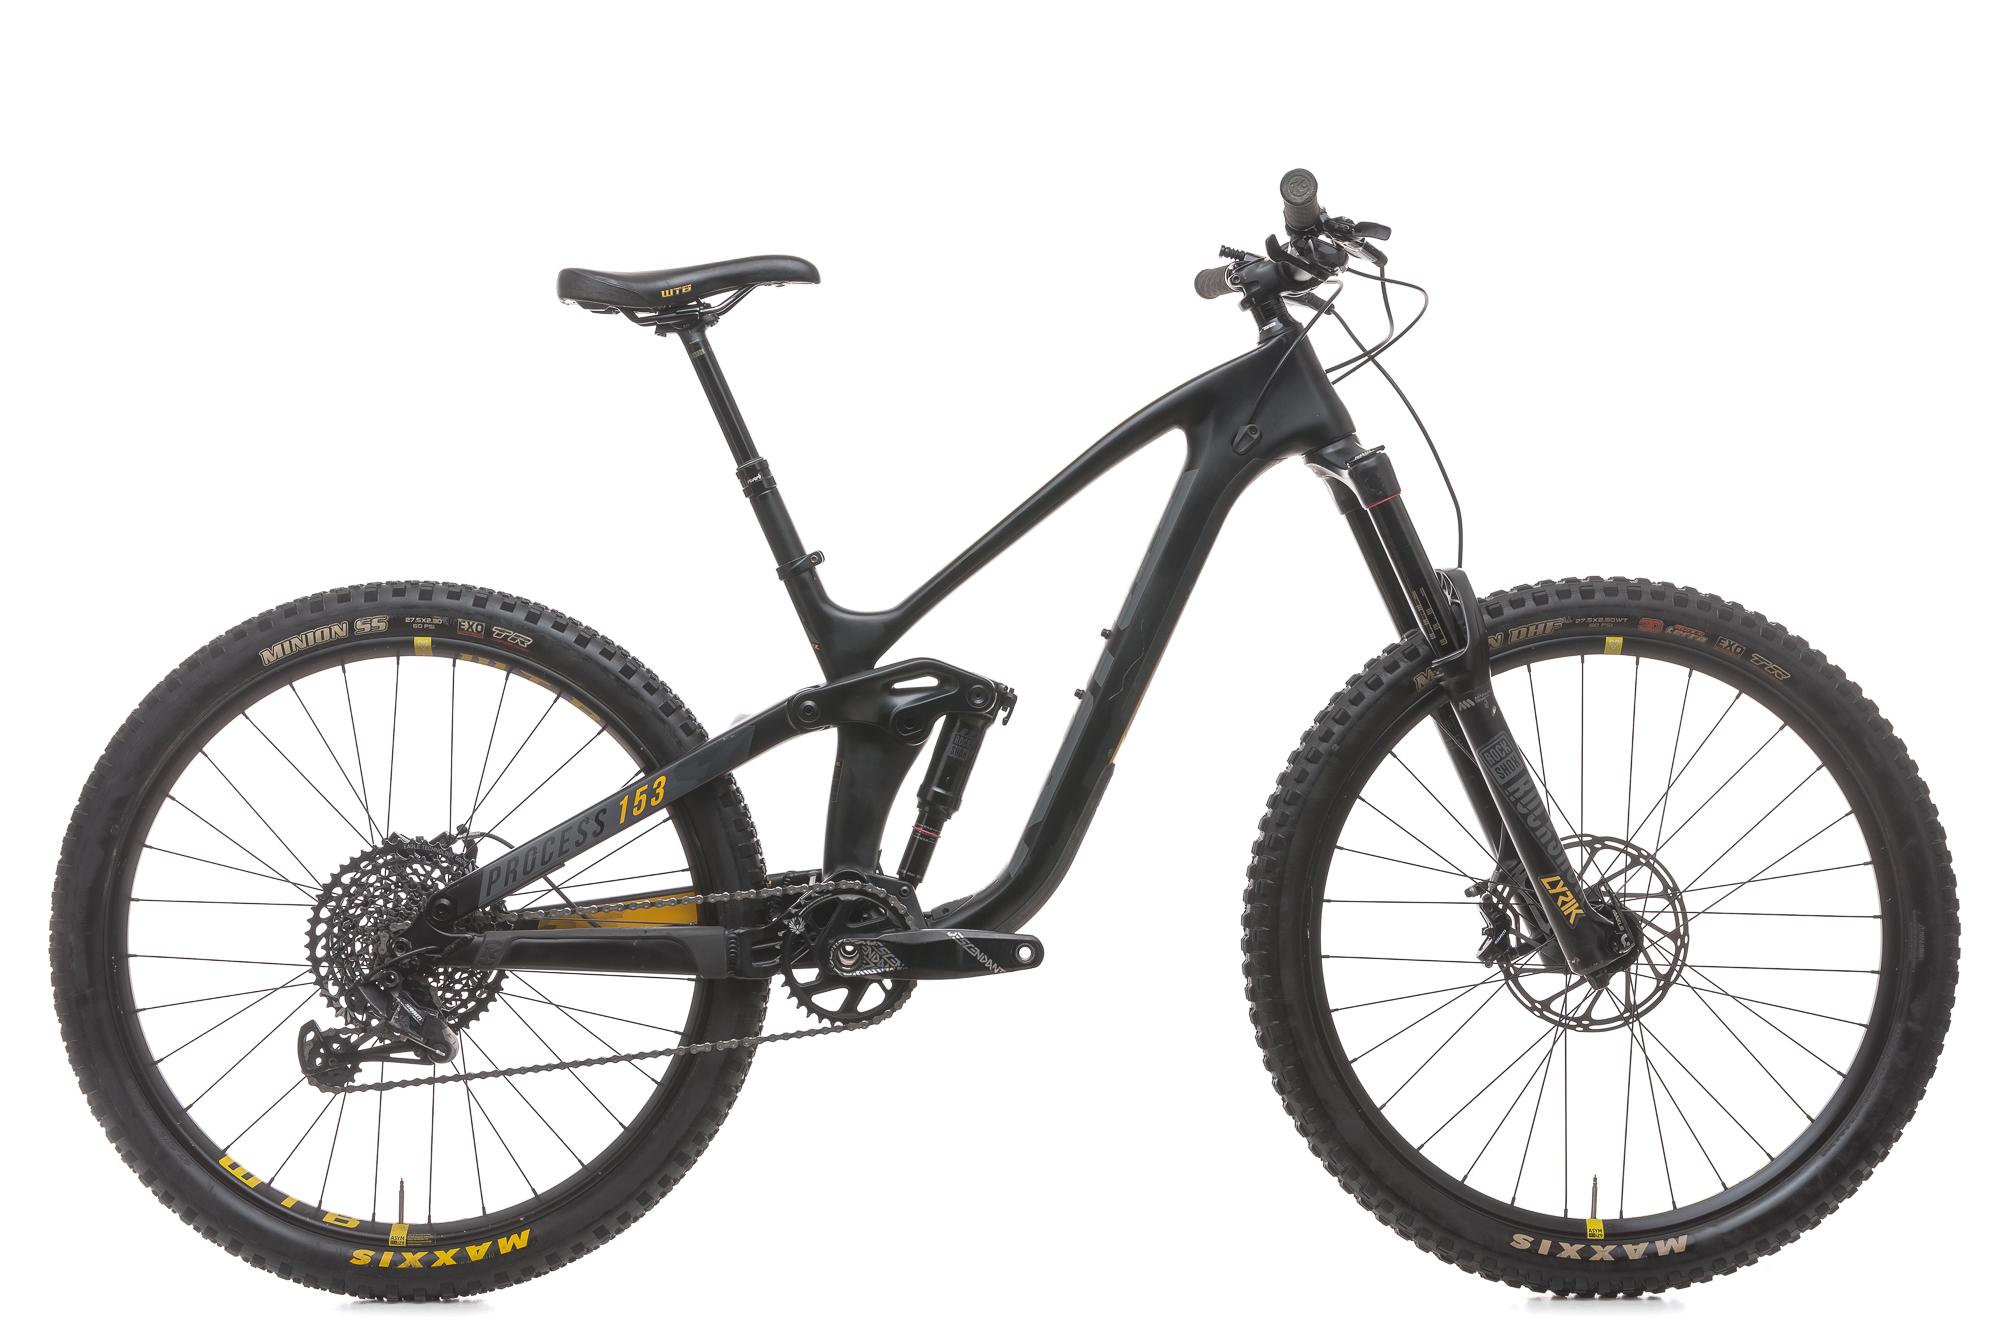 2018 Kona Process 153 Cr Mountain Bike Small 27 5 Carbon Sram Gx1